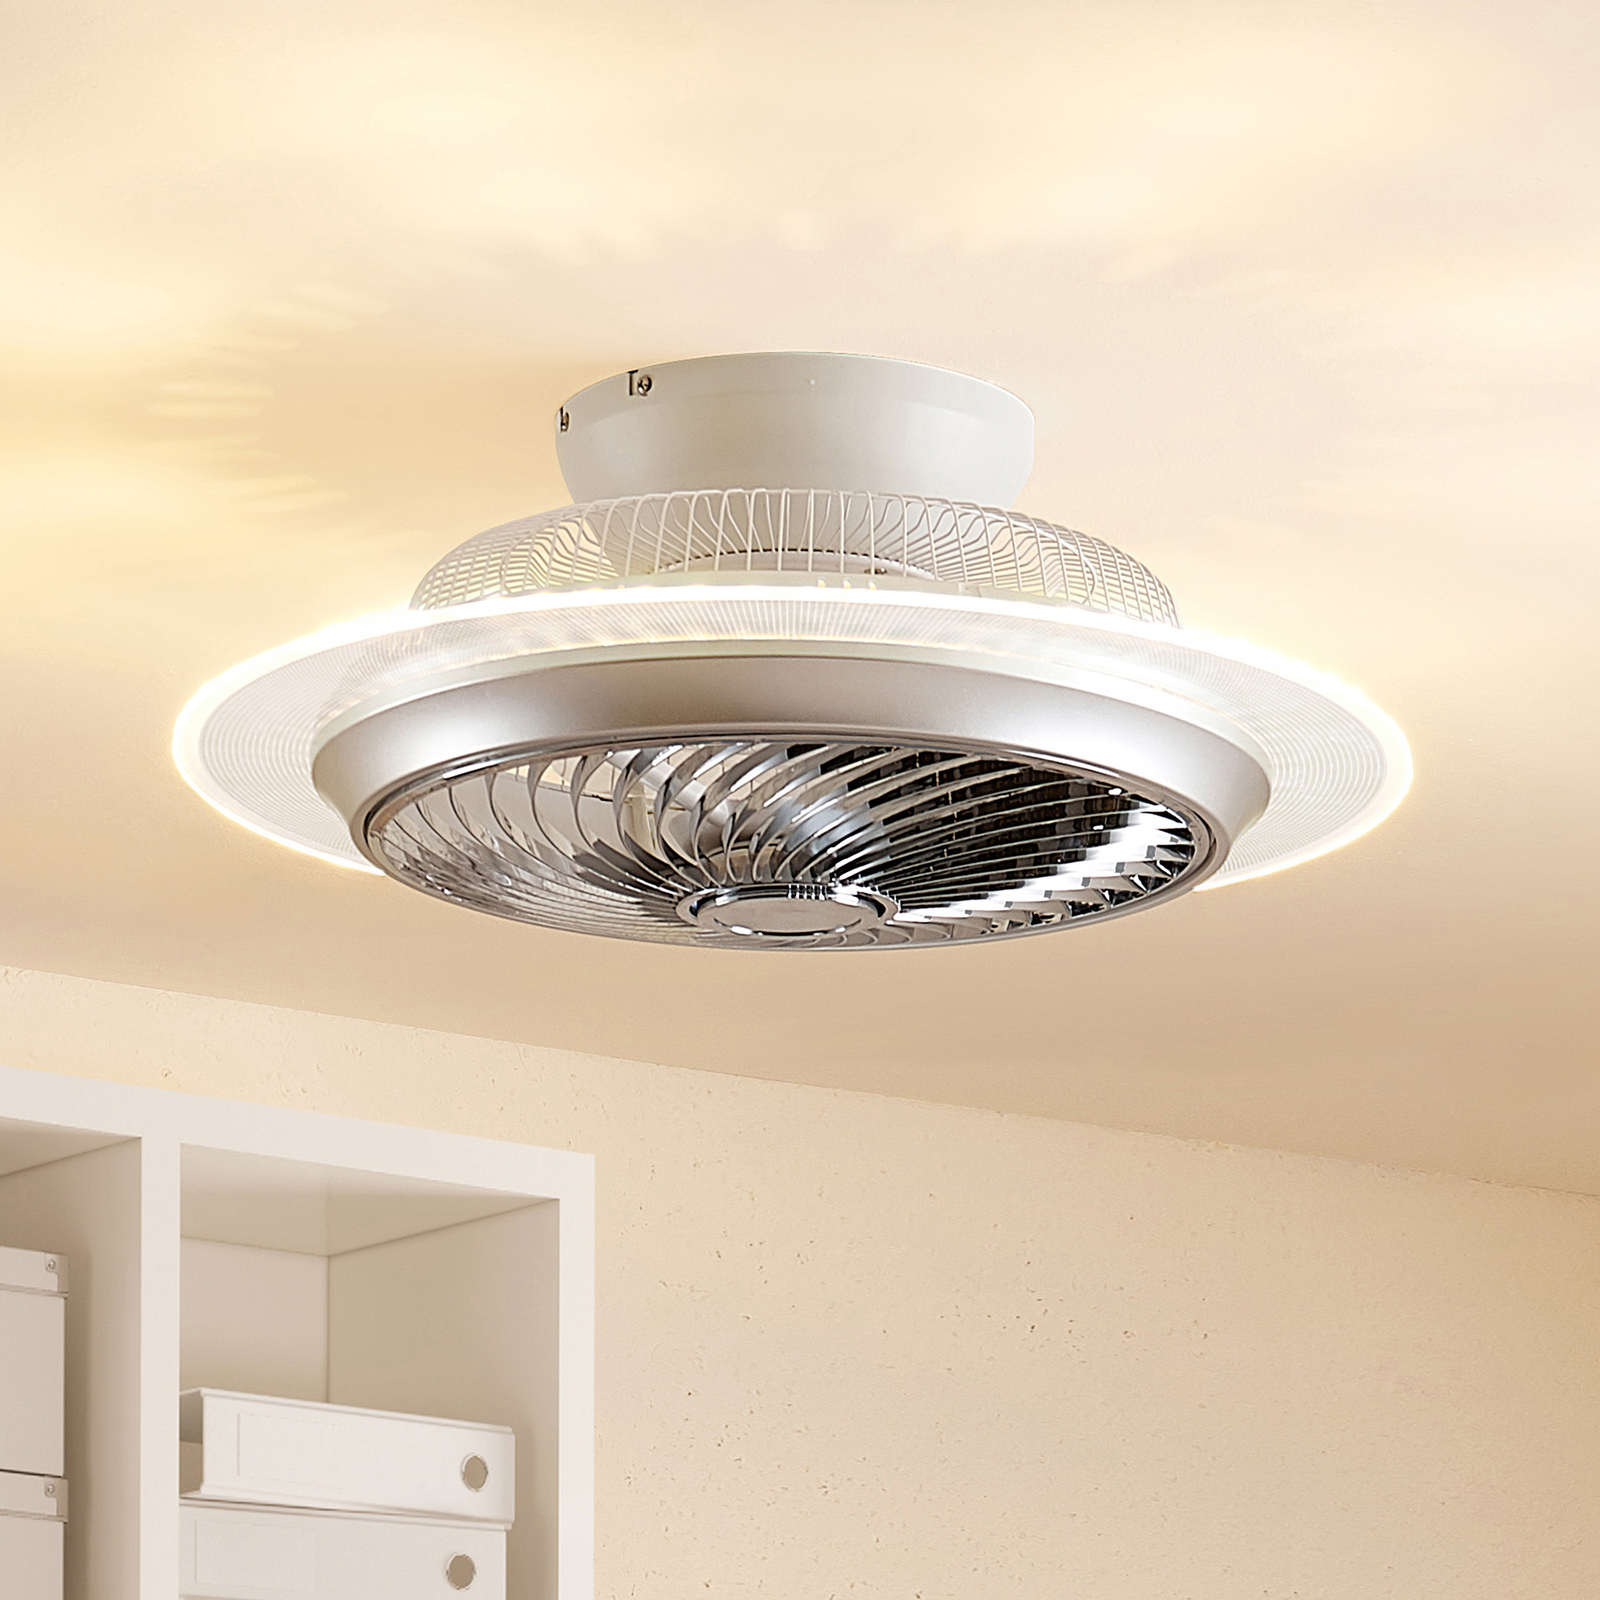 Starluna Yolina ventilatore a pale LED con luce